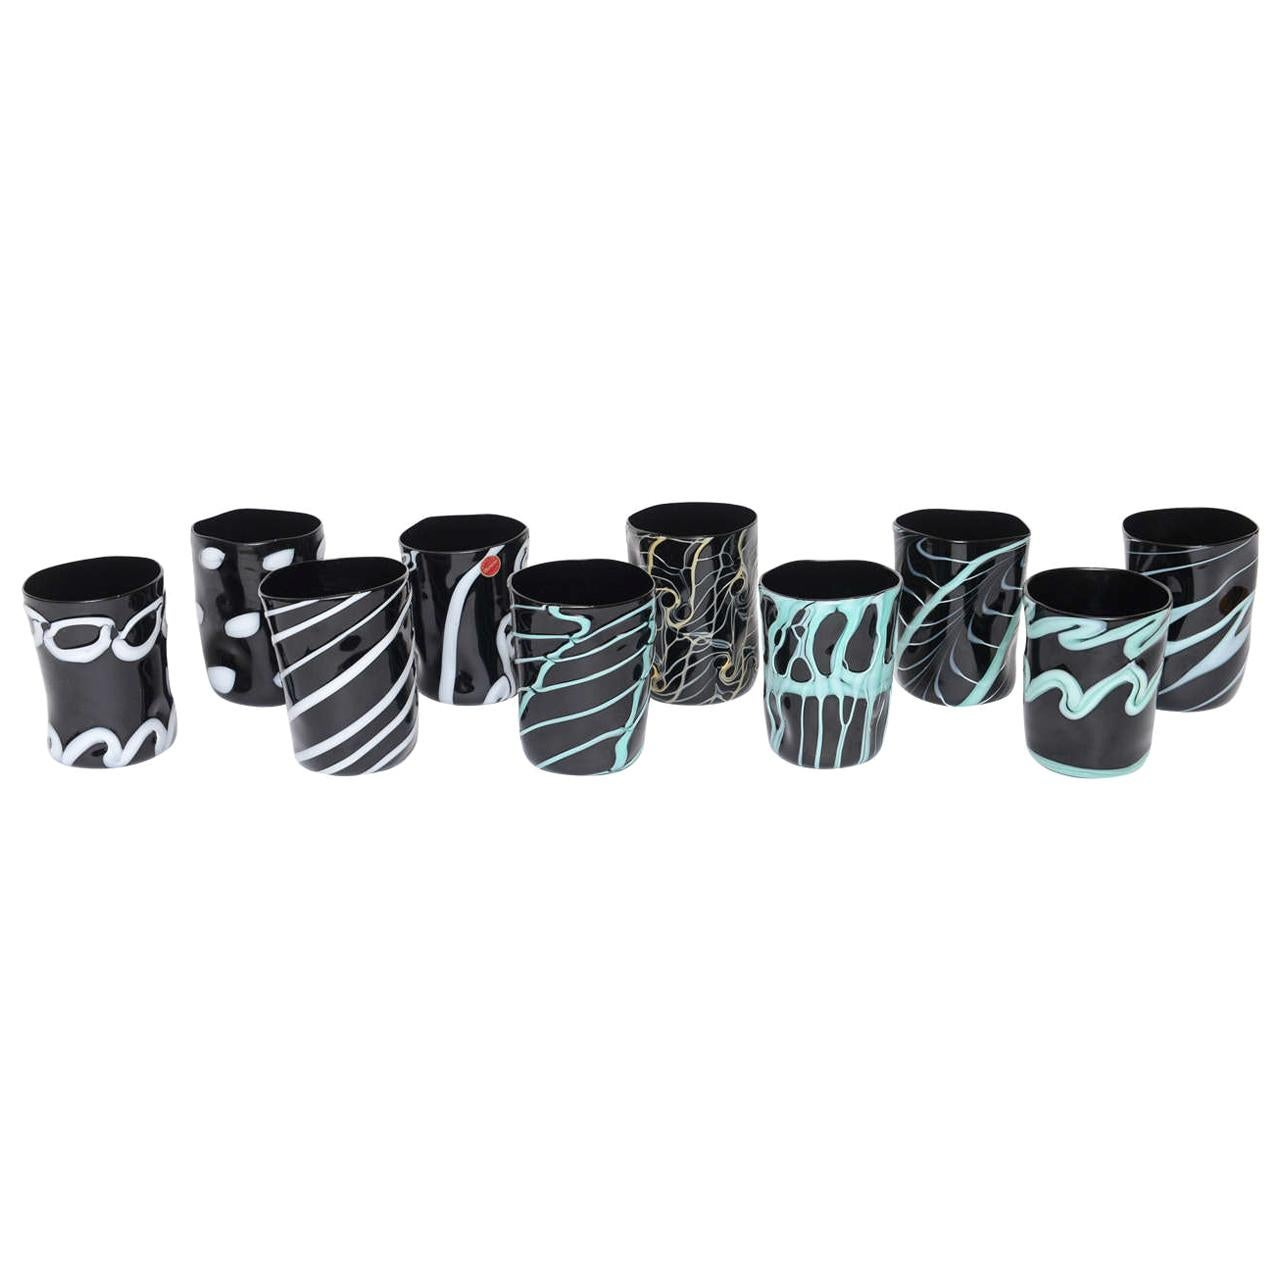 Rare Handblown Black Murano Glass Tumblers, Set of Ten